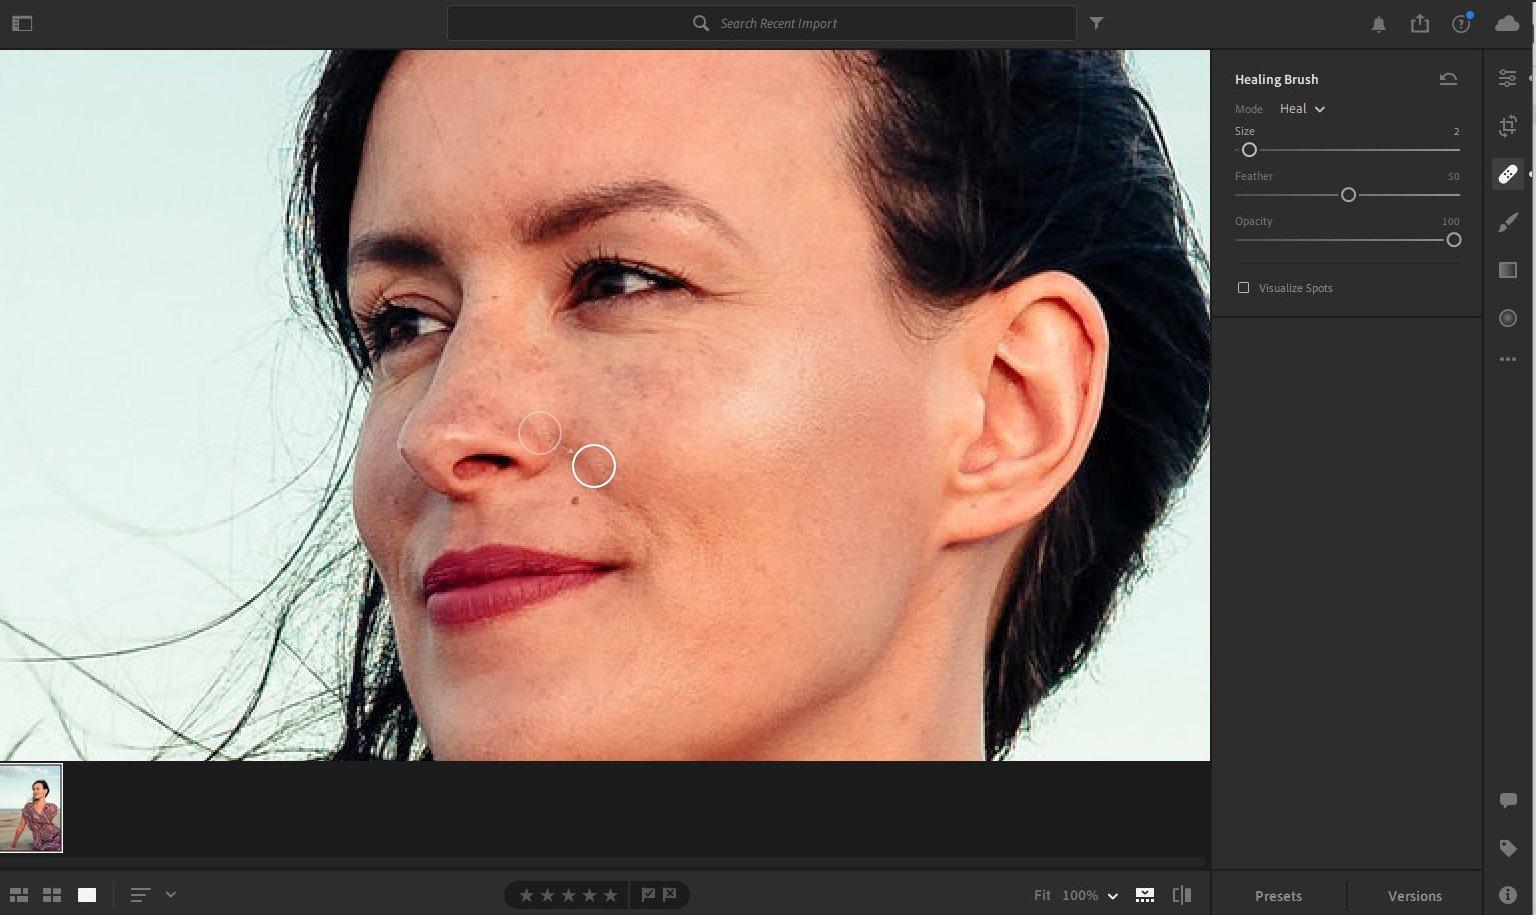 lightroom portrait editing - healing